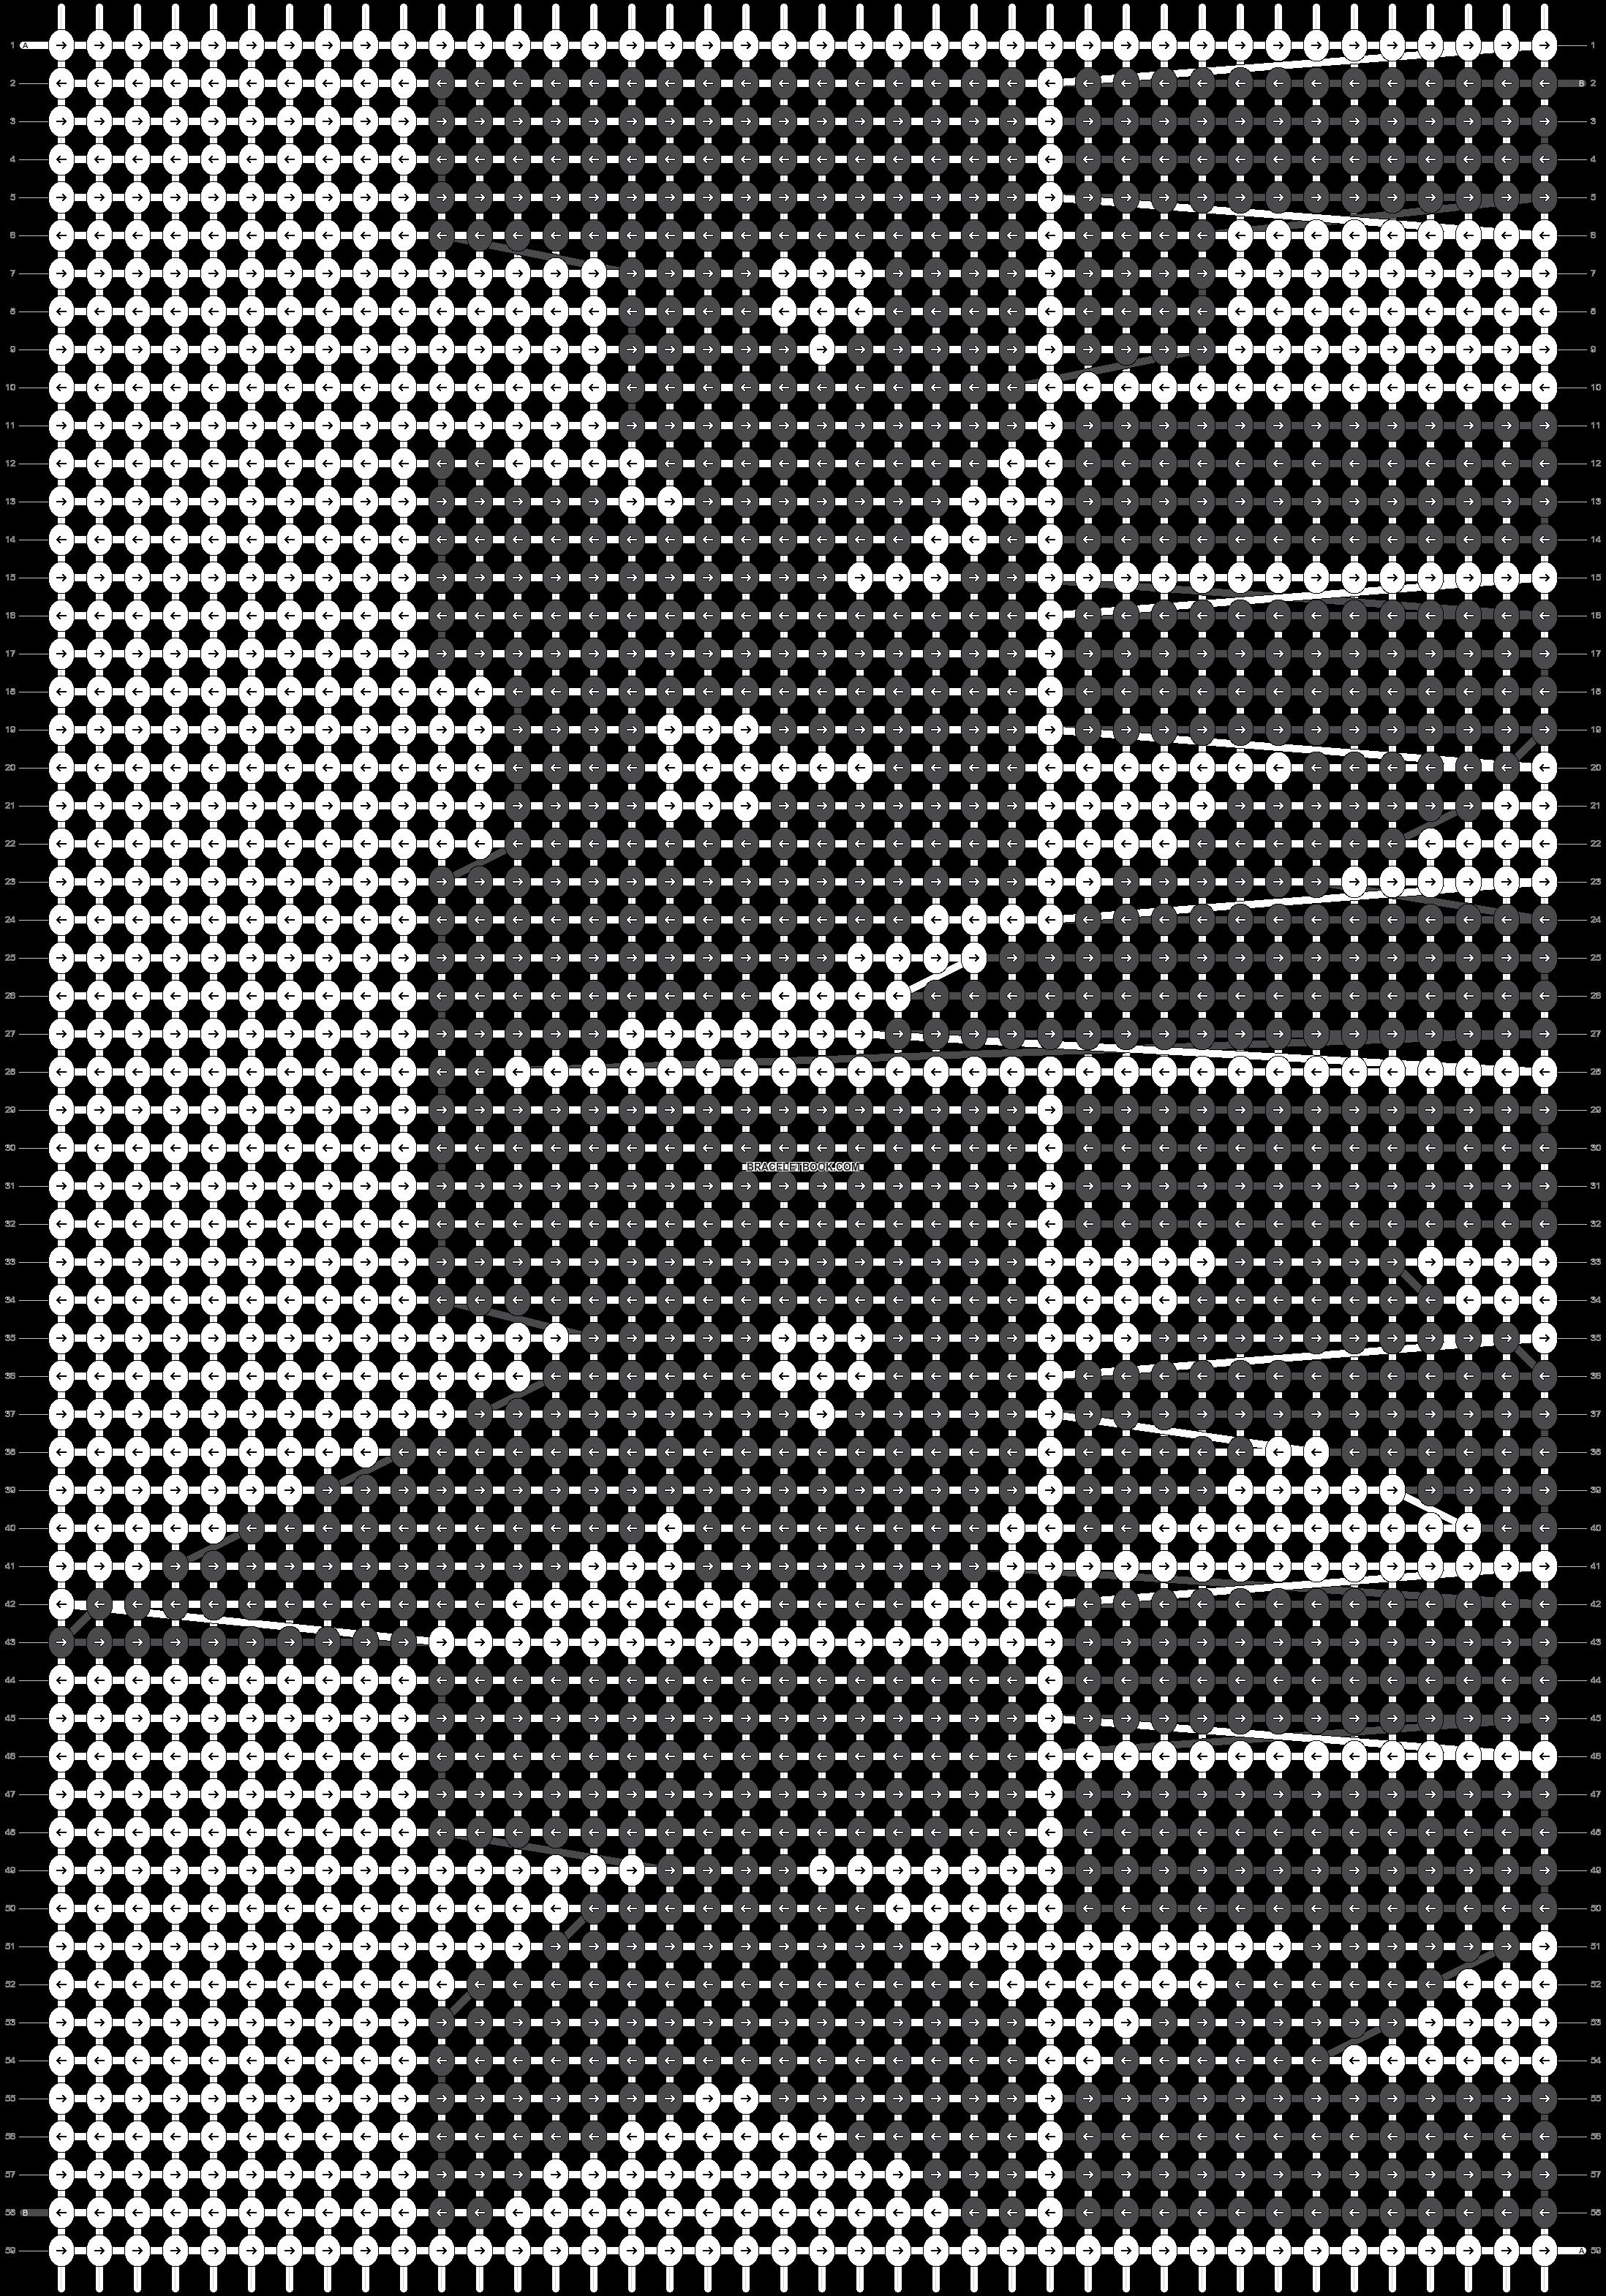 Alpha Pattern #22104 added by Link